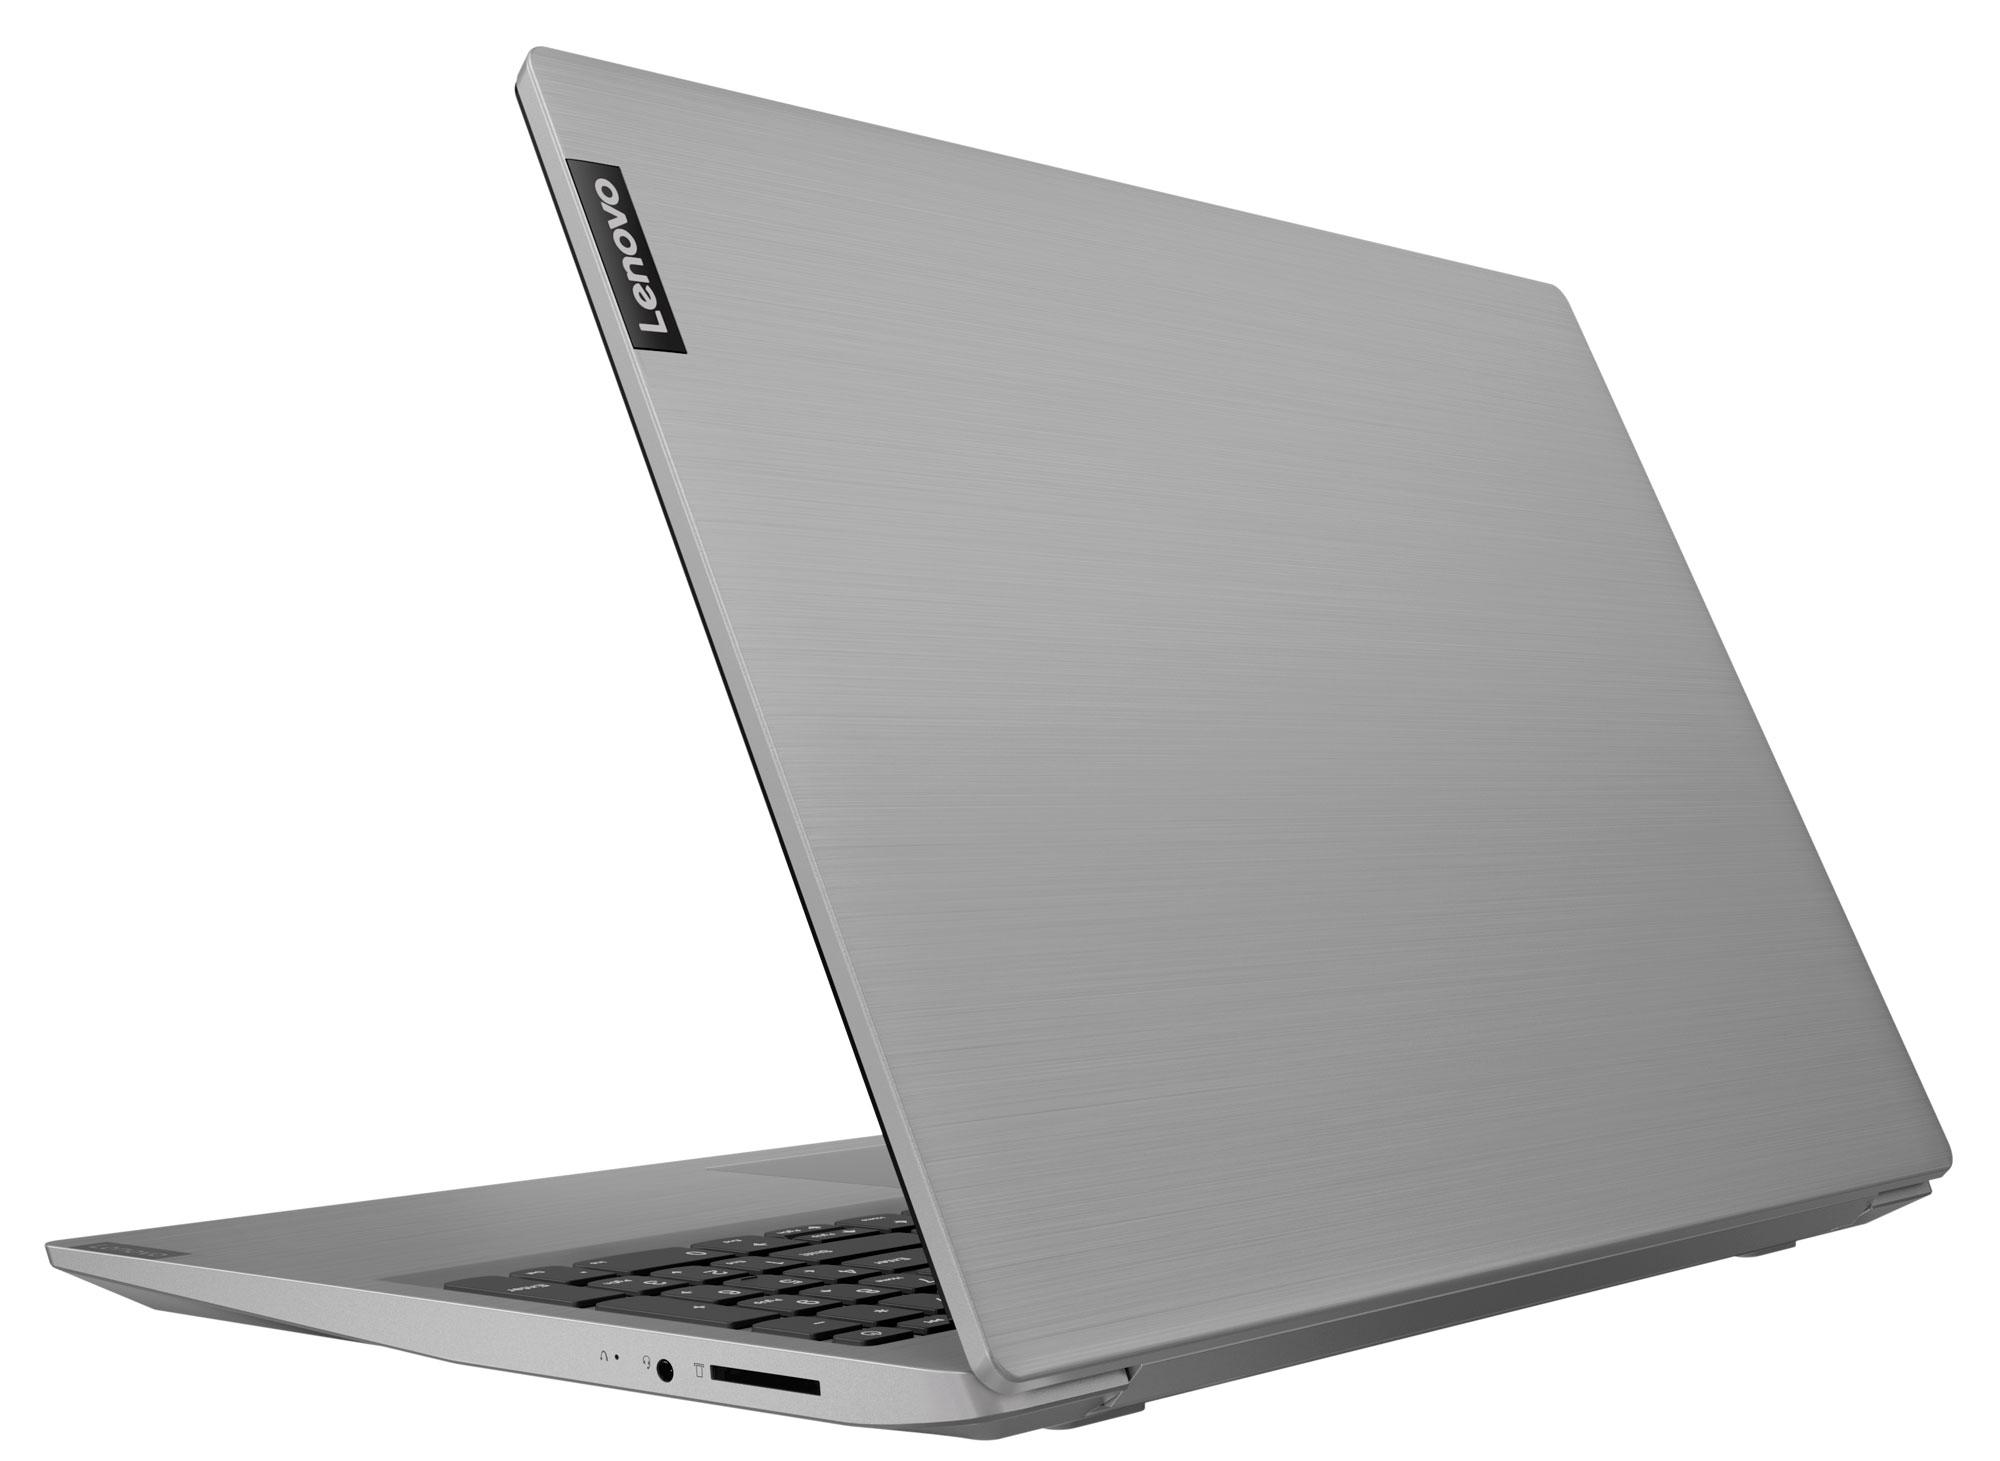 Фото  Ноутбук Lenovo ideapad S145-15IGM Grey (81MX001KRE)